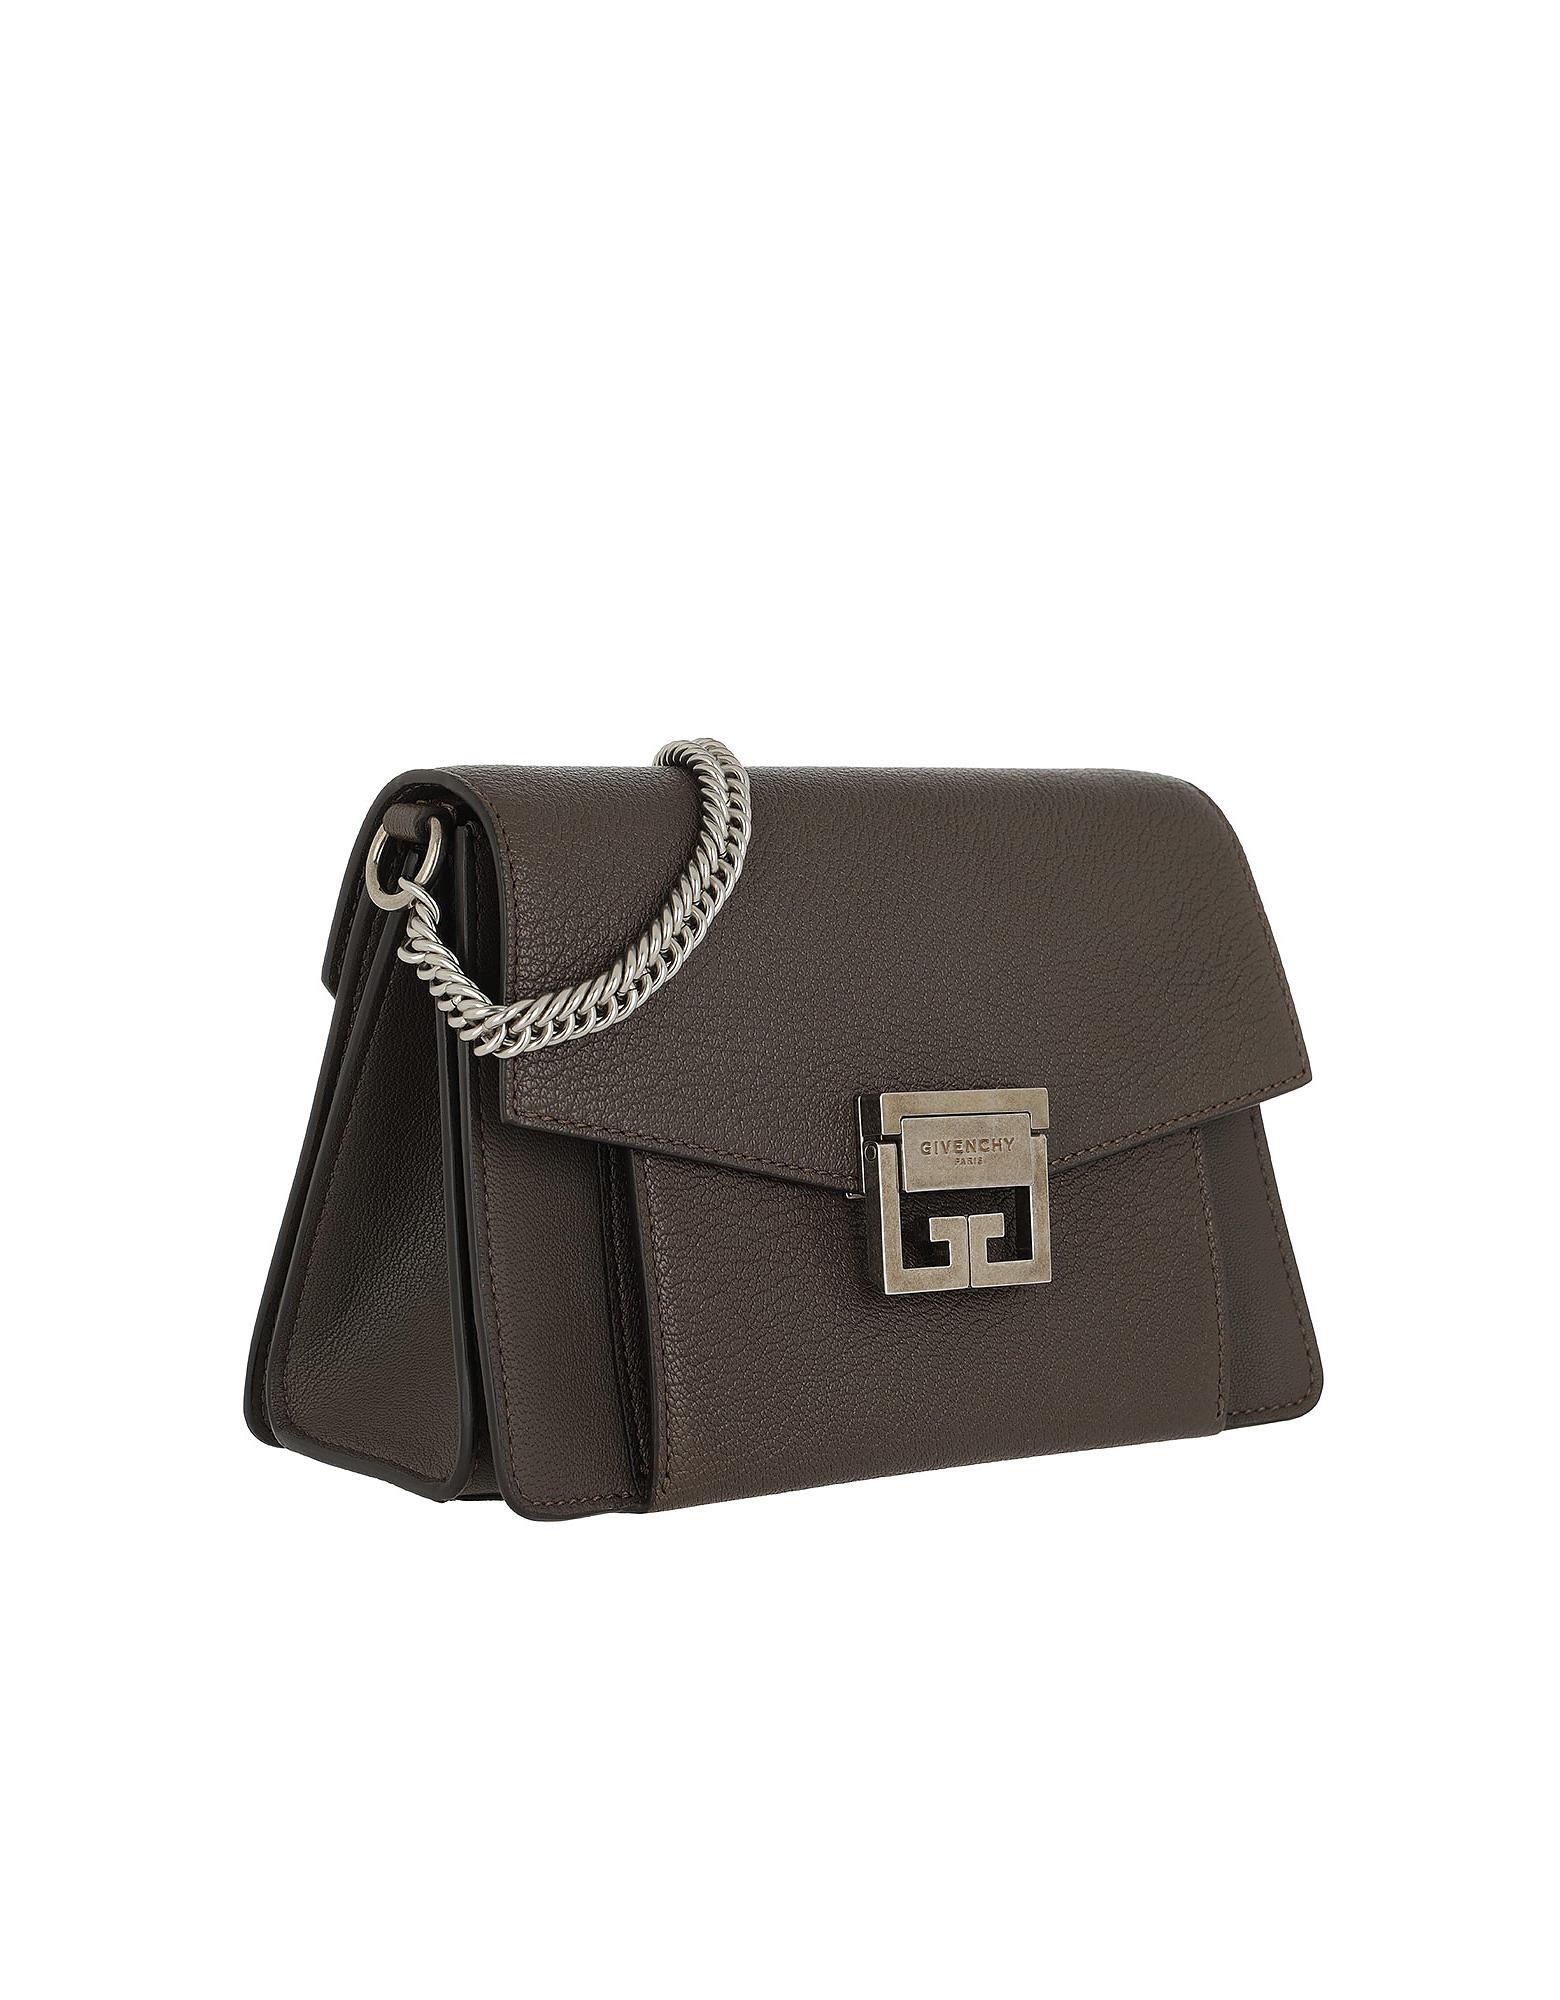 Lyst - Givenchy Gv3 Nano Crossbody Bag Leather Grey in Gray ca77d9c09f480